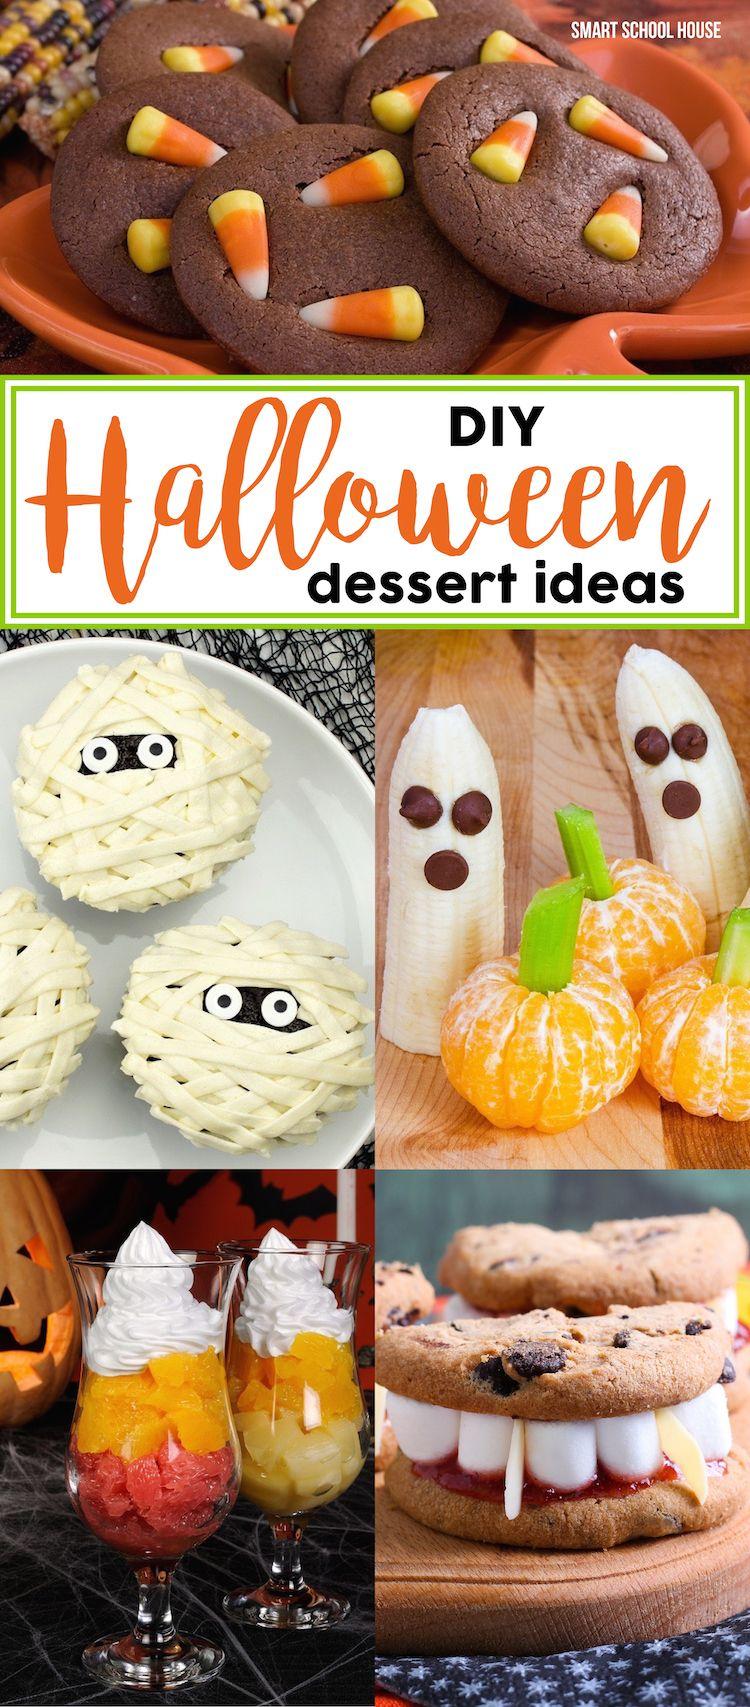 Halloween dessert ideas that are genius but simple